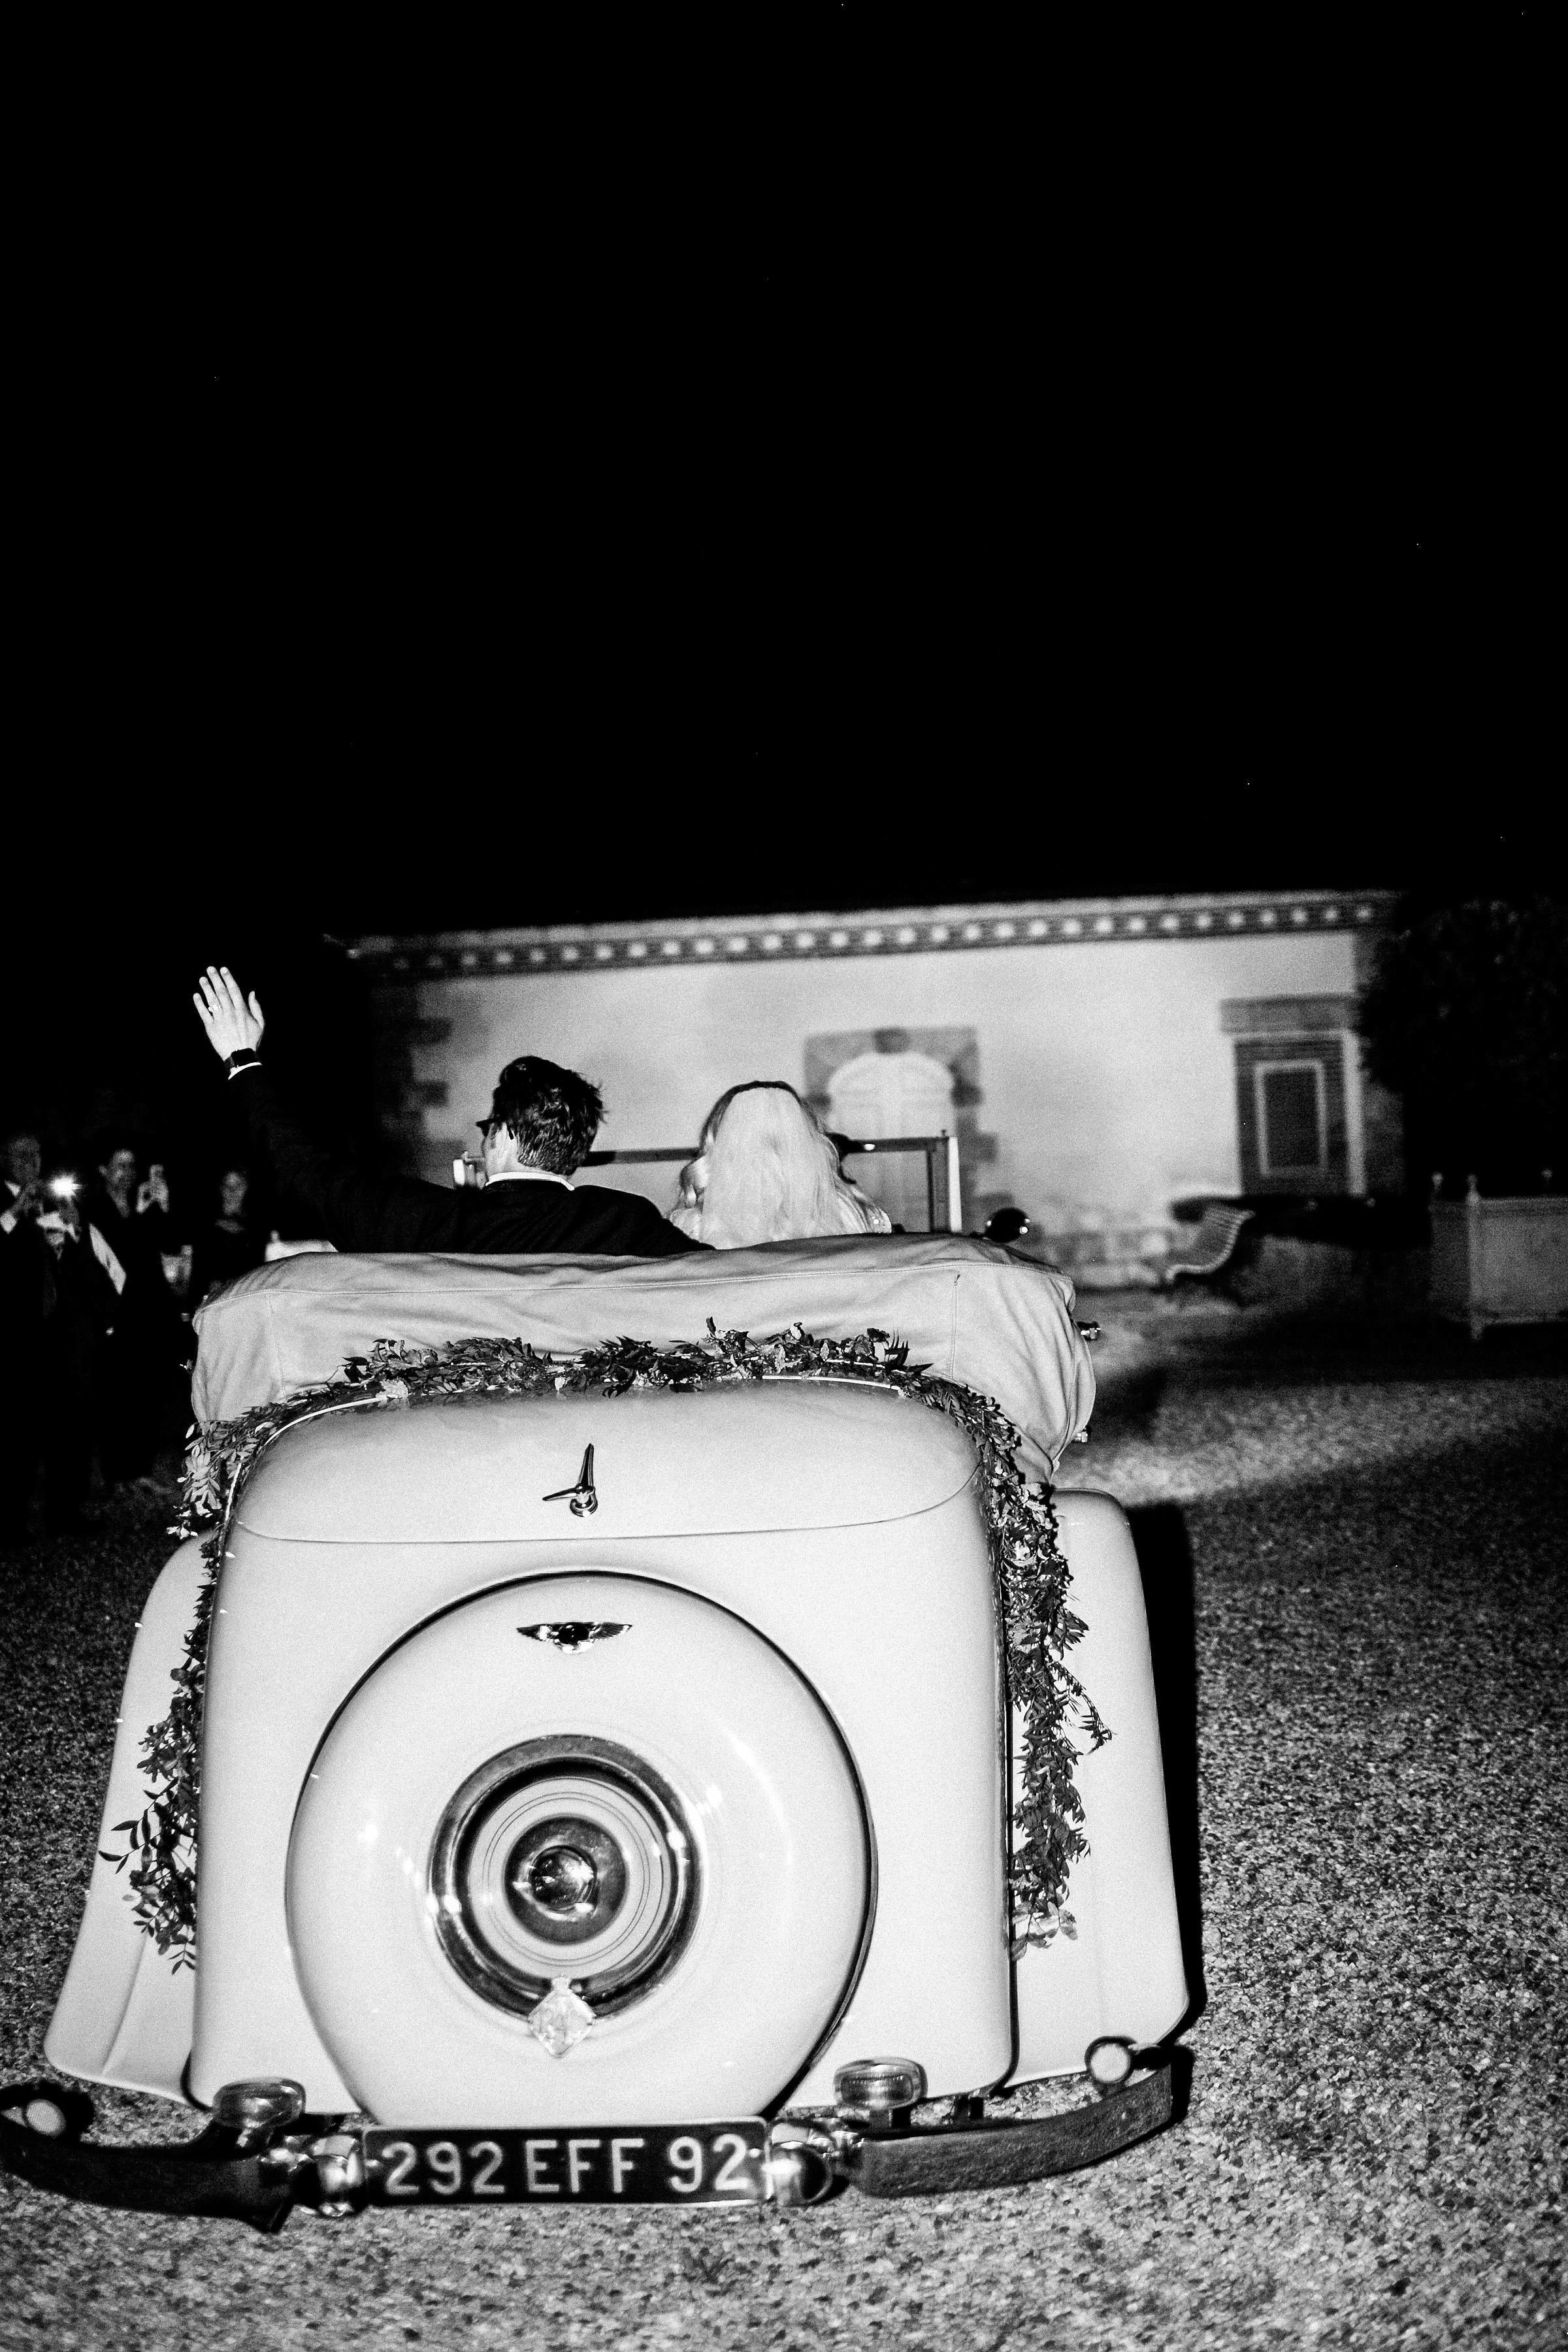 rachael cameron wedding getaway car